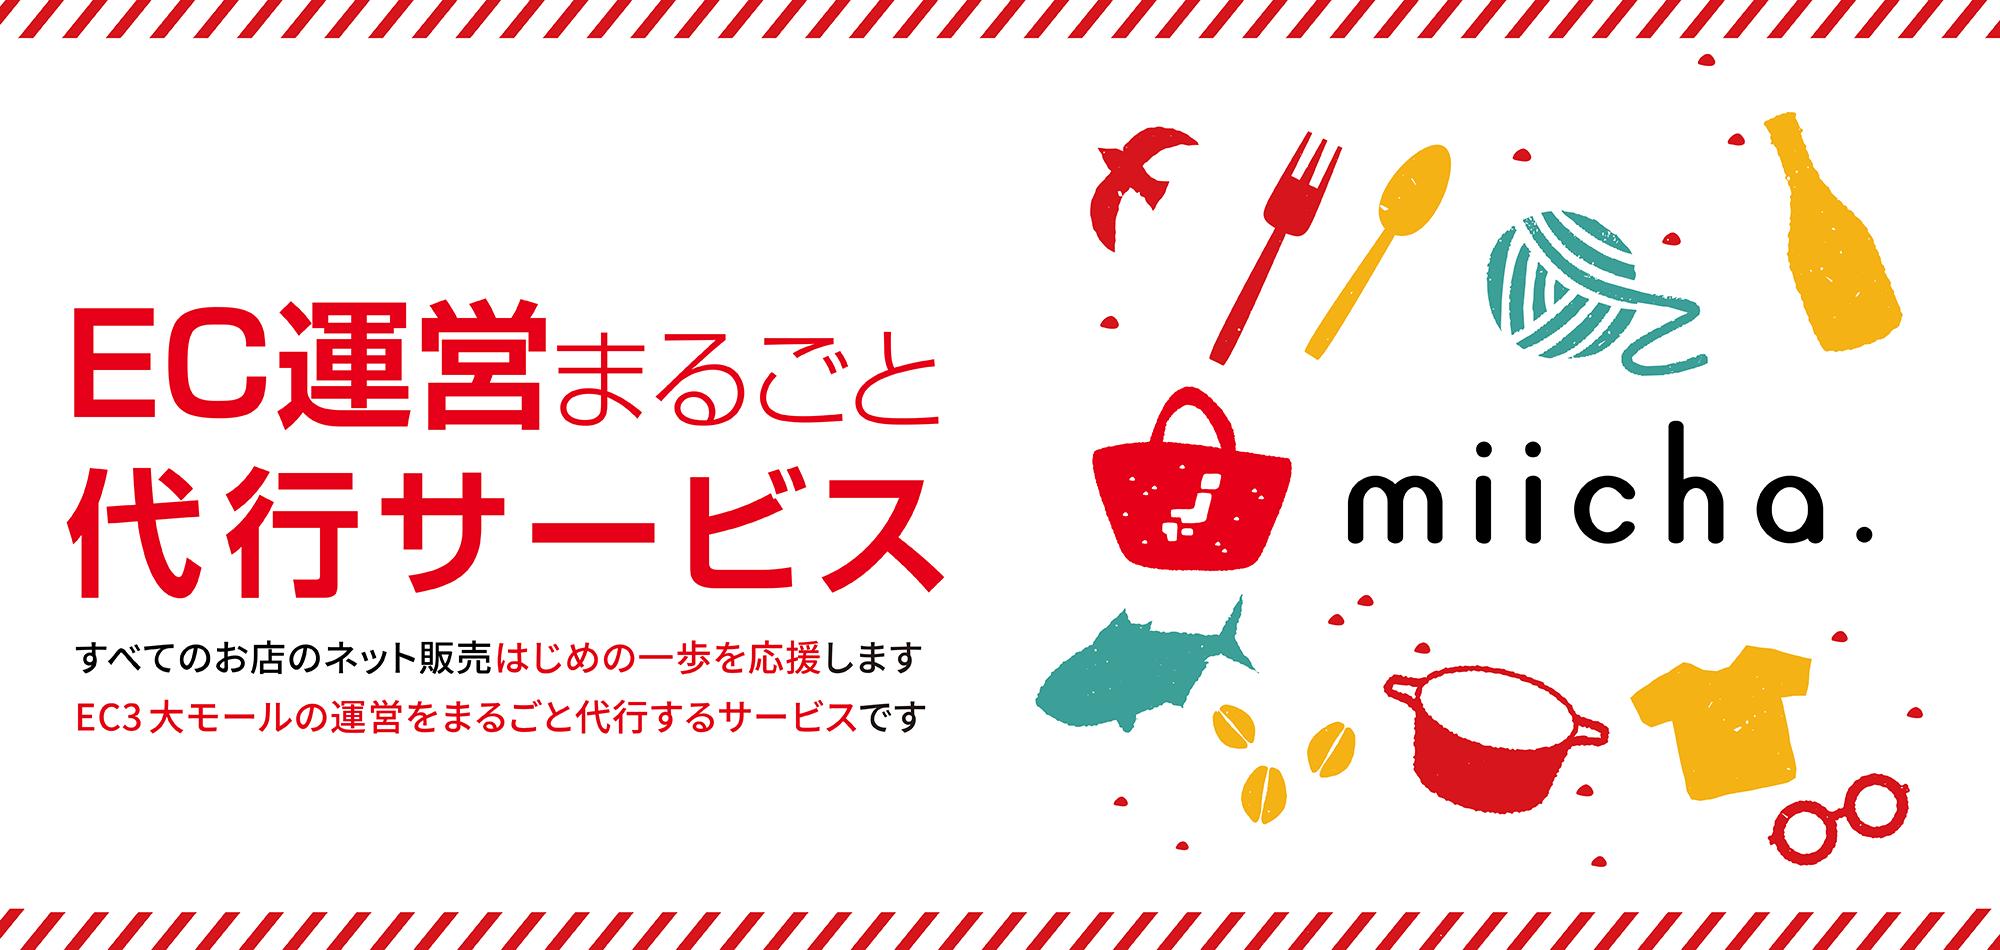 miicha_join